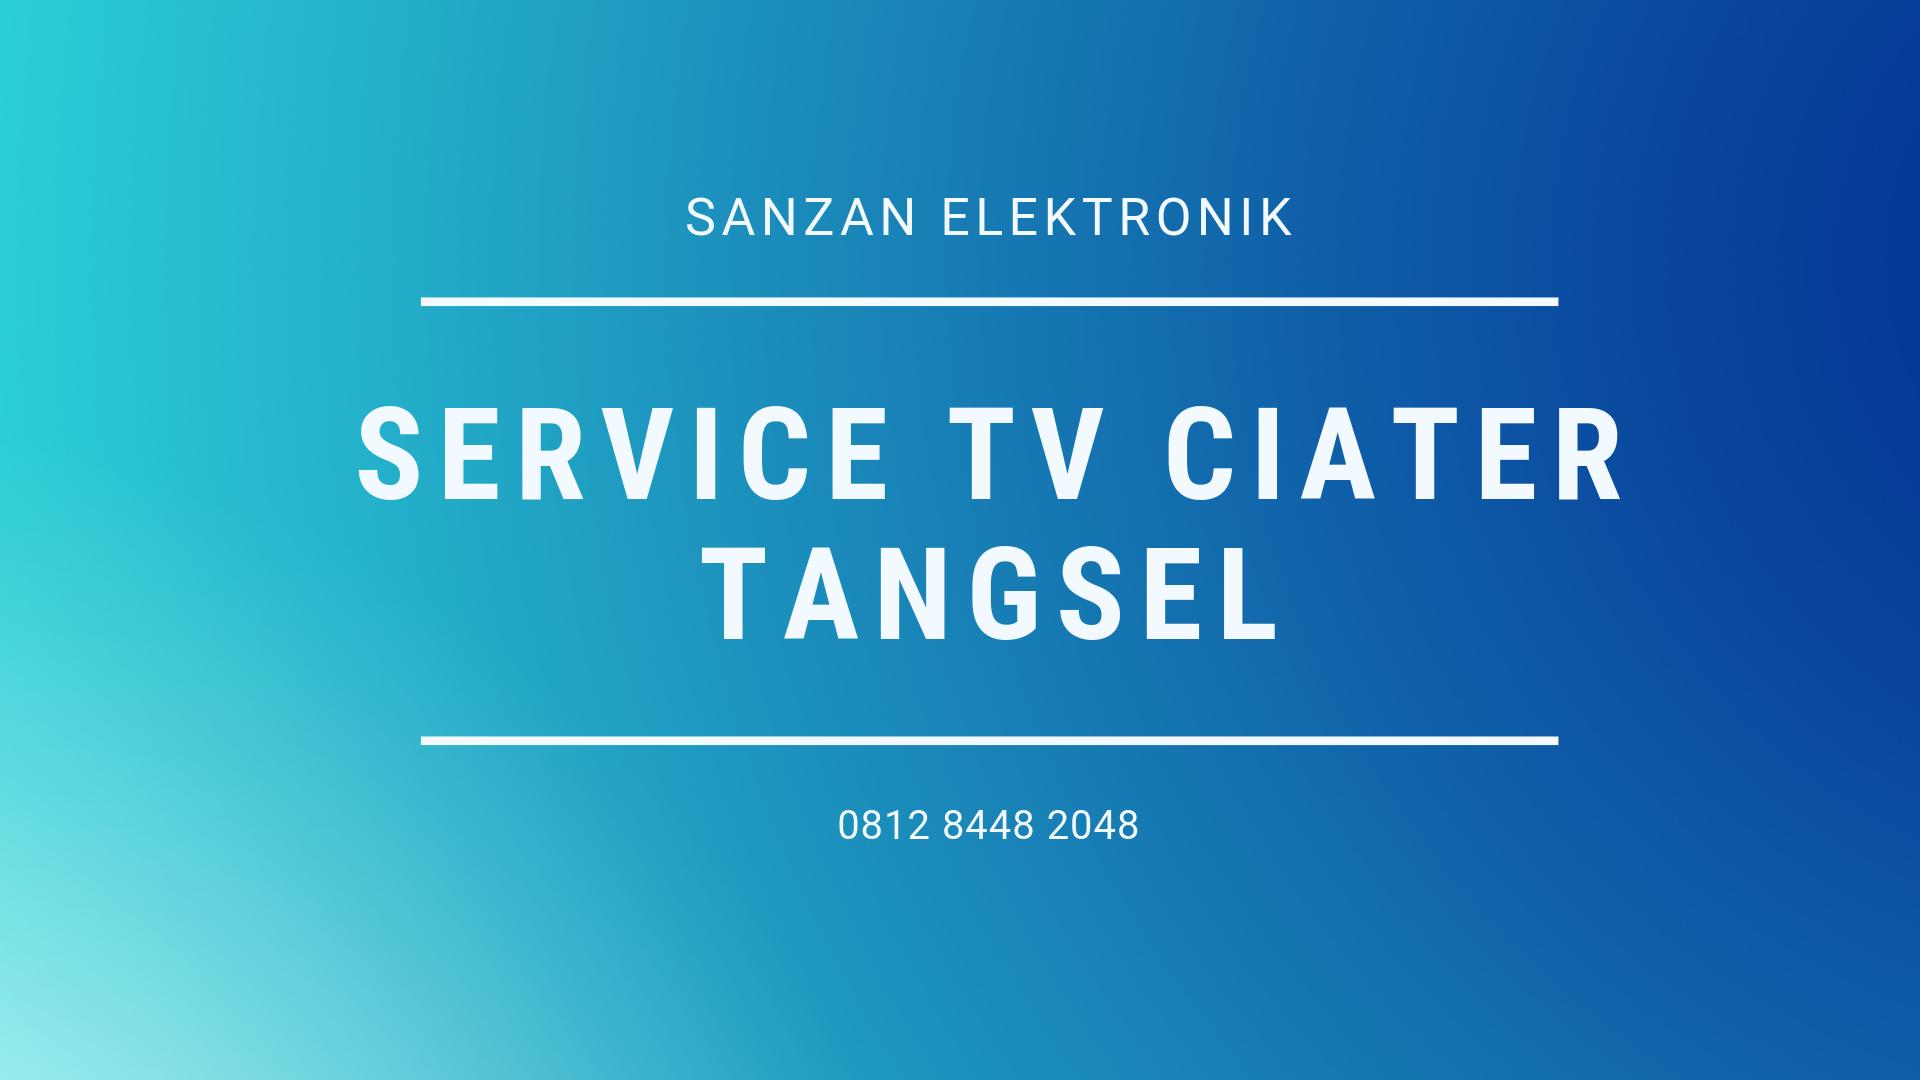 Service TV Ciater Tangsel